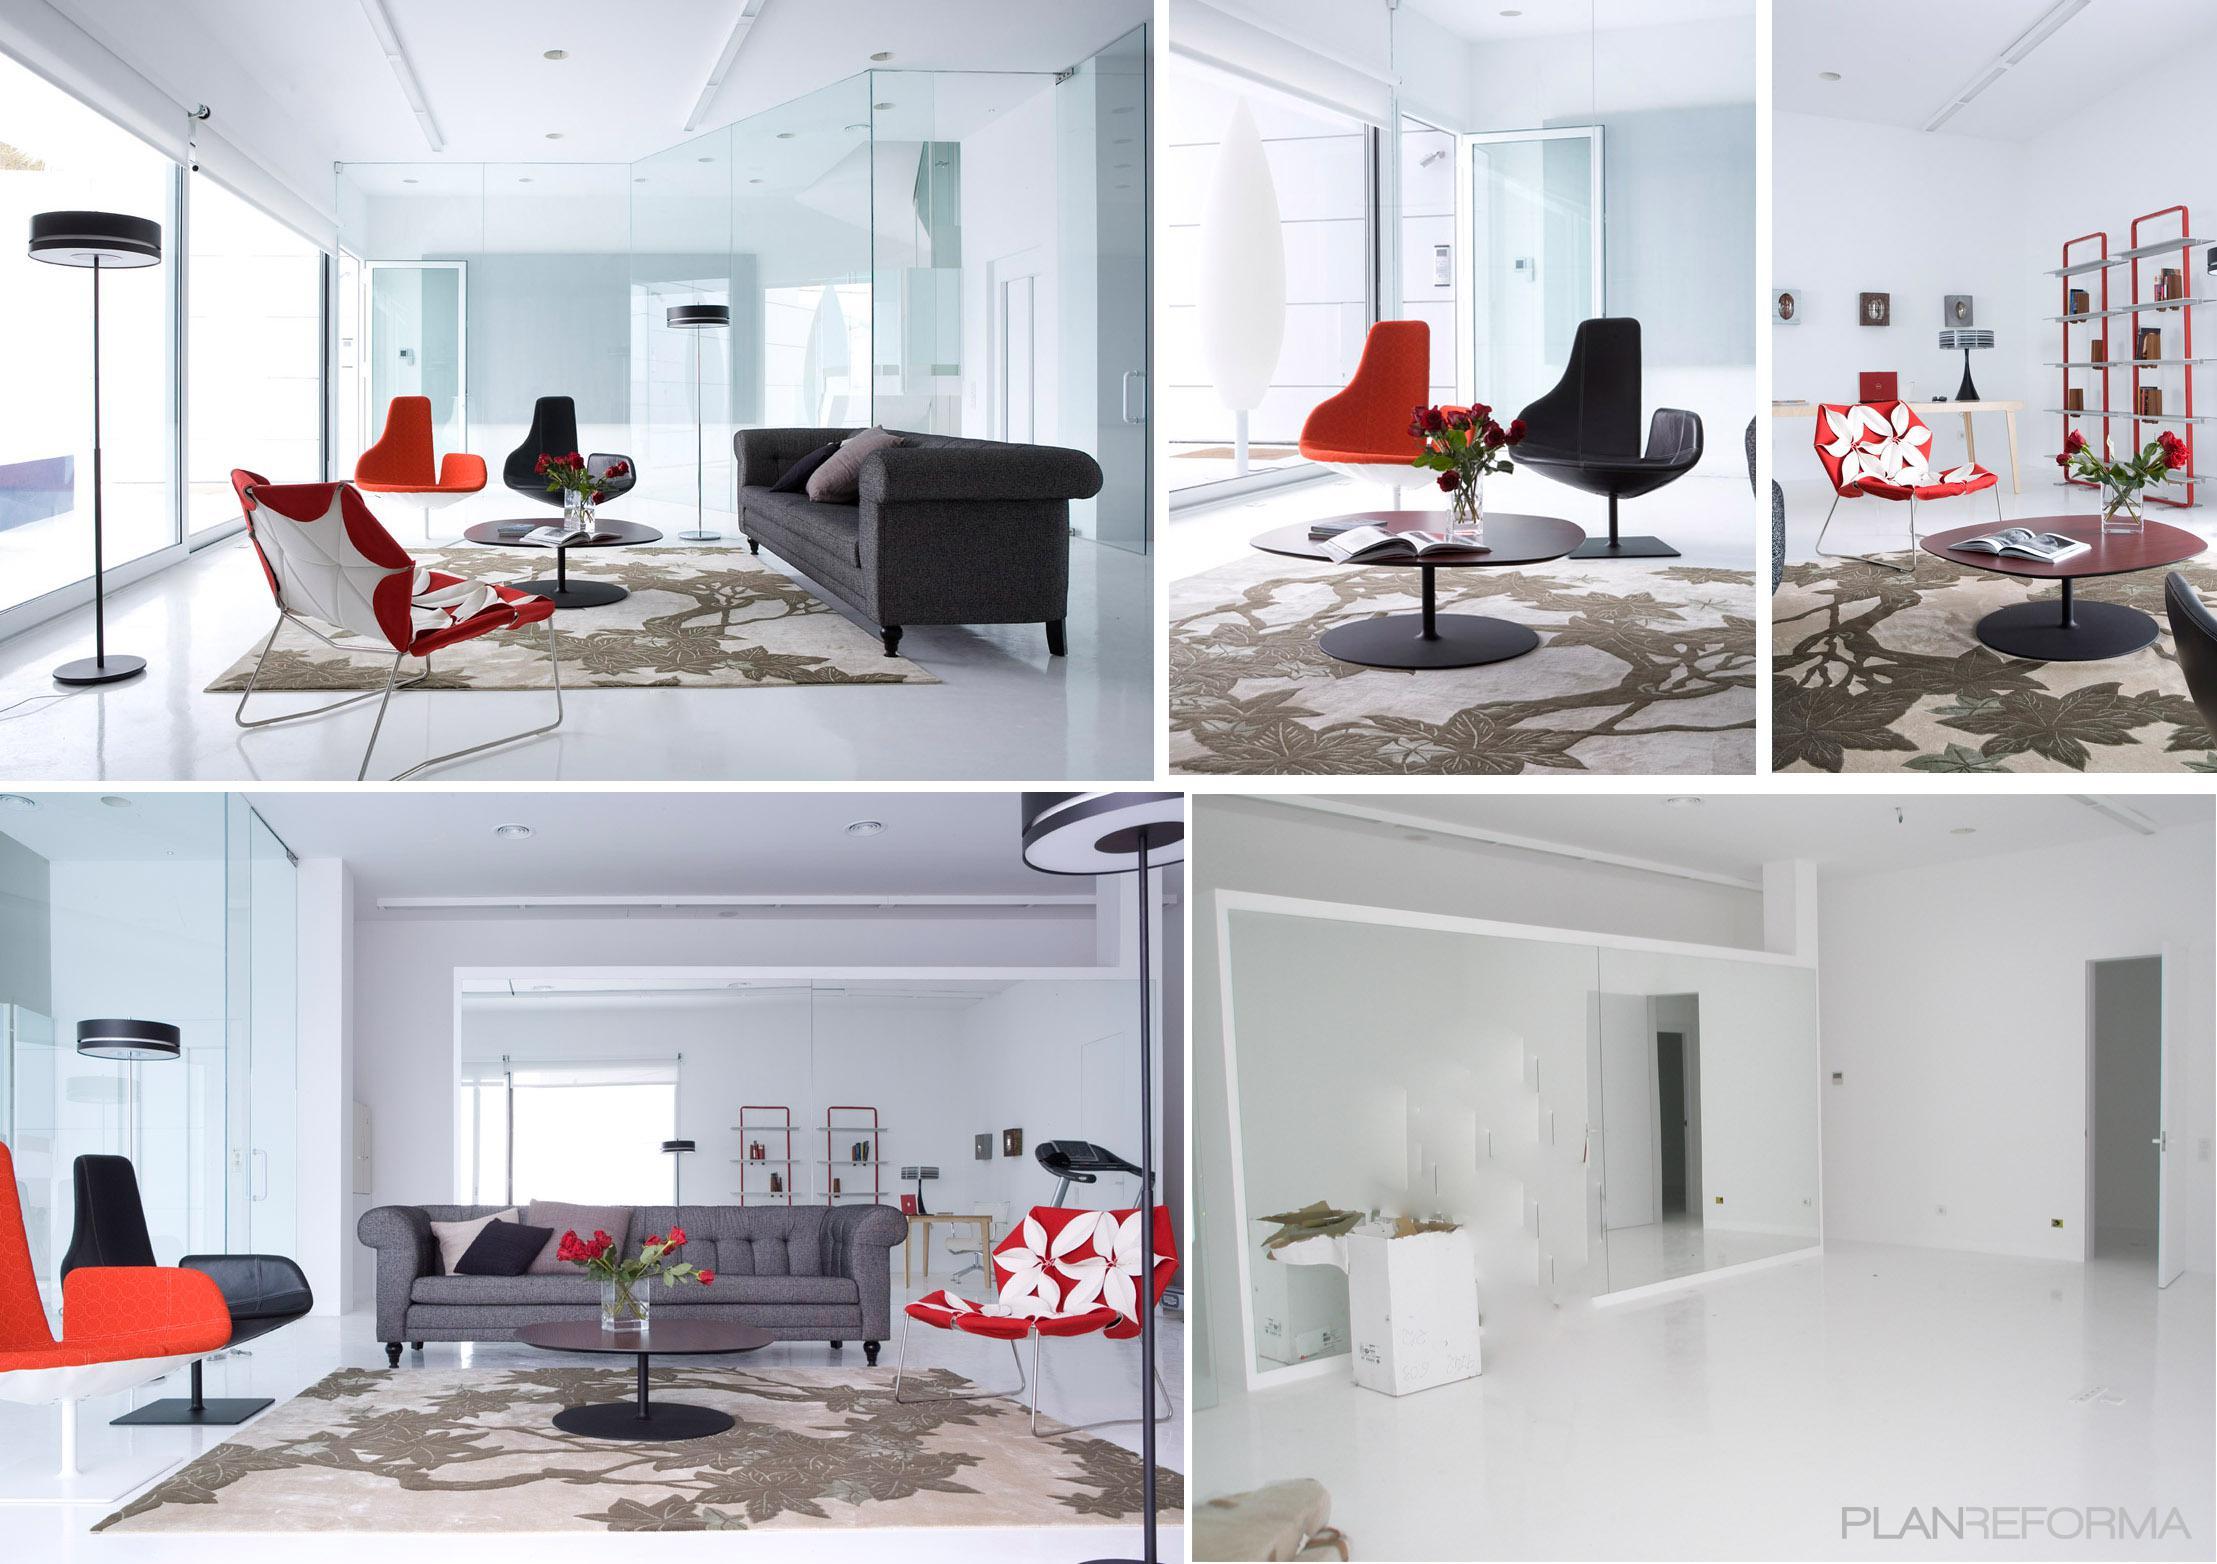 Salon style moderno color rojo blanco gris - Salon moderno blanco ...